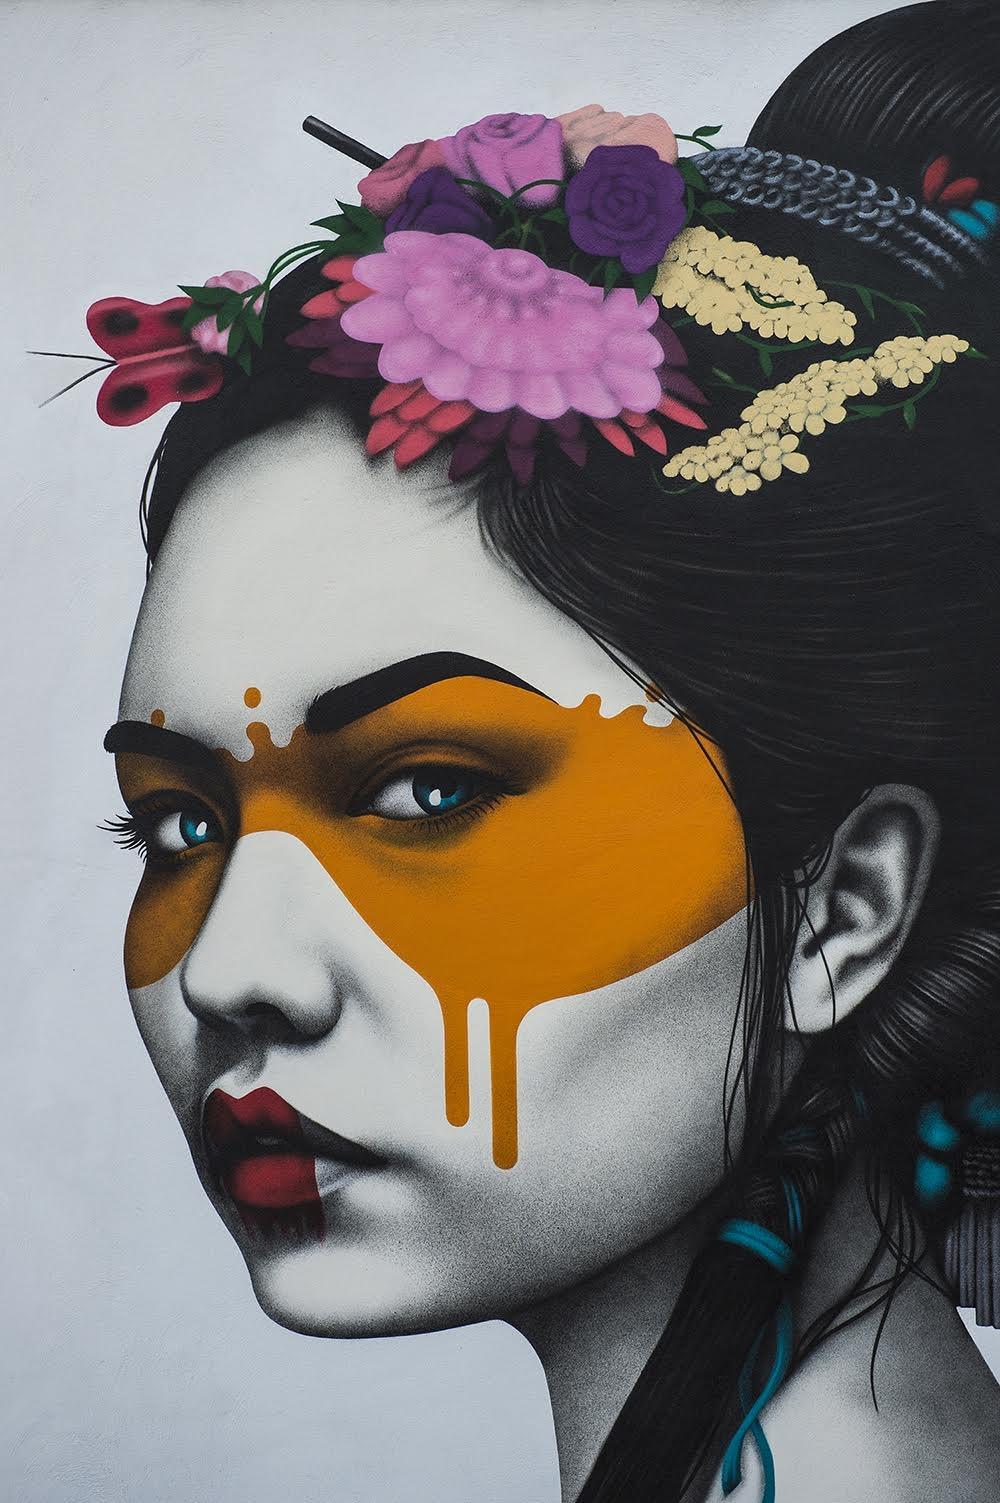 Artist Travels the World to Paint Stunning Graffiti